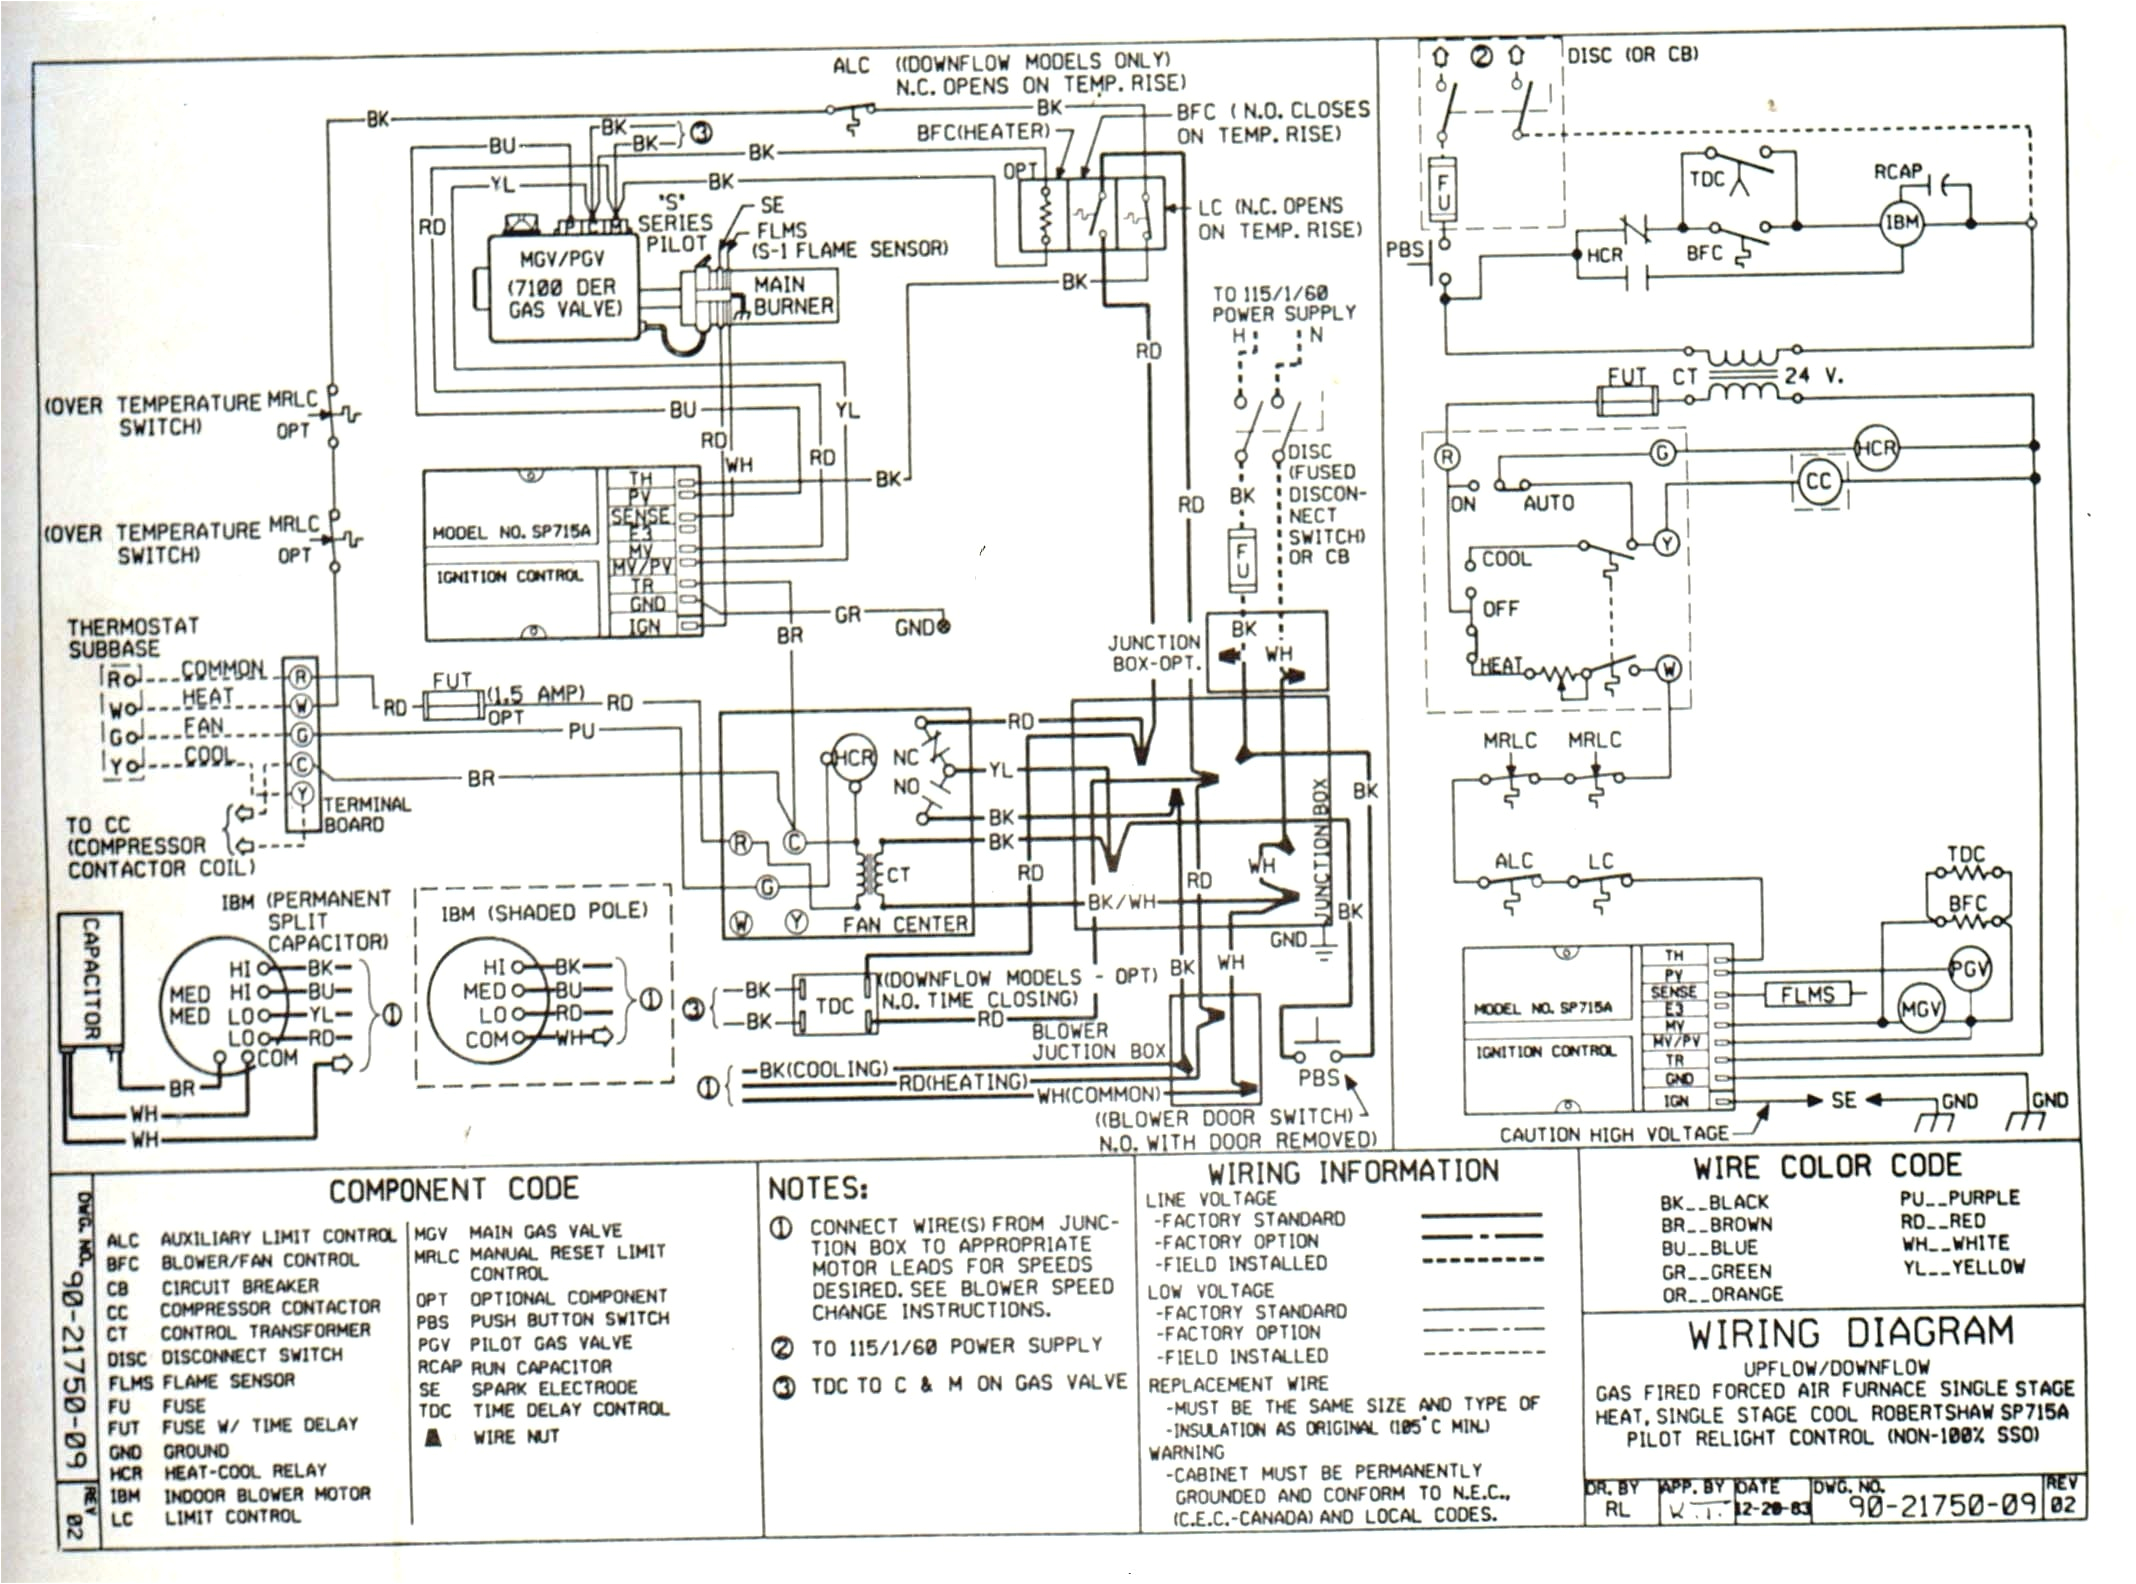 wiring diagram rheem criterion 2 wiring diagram files rheem criterion gas furnace wiring diagram rheem gas heater wiring diagram